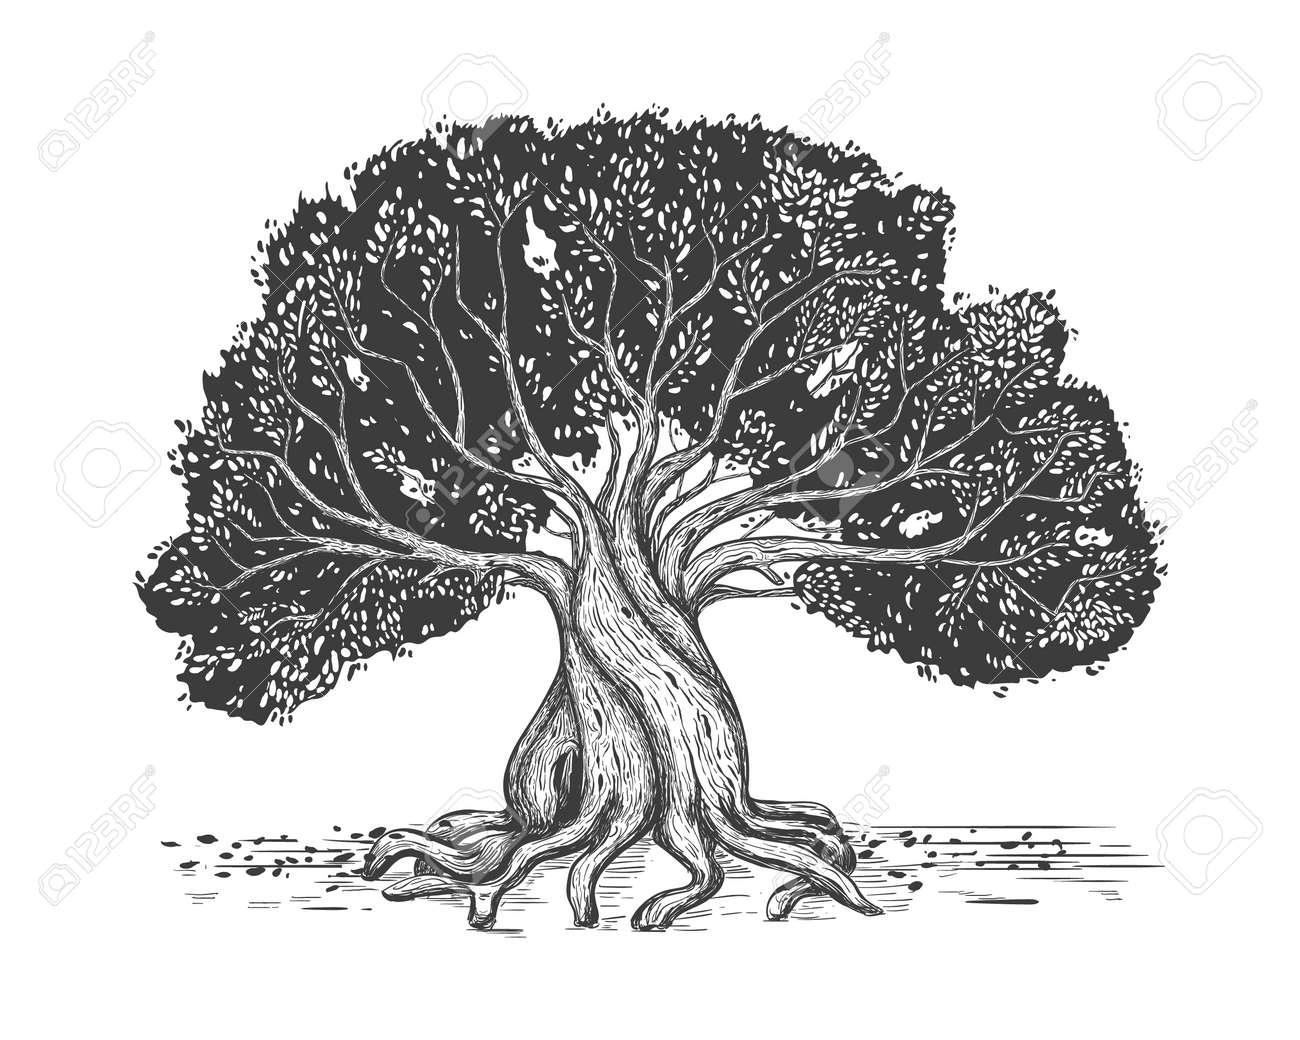 Family tree hand drawn sketch print. Genealogical tree. Stylized old olive tree. - 165239157